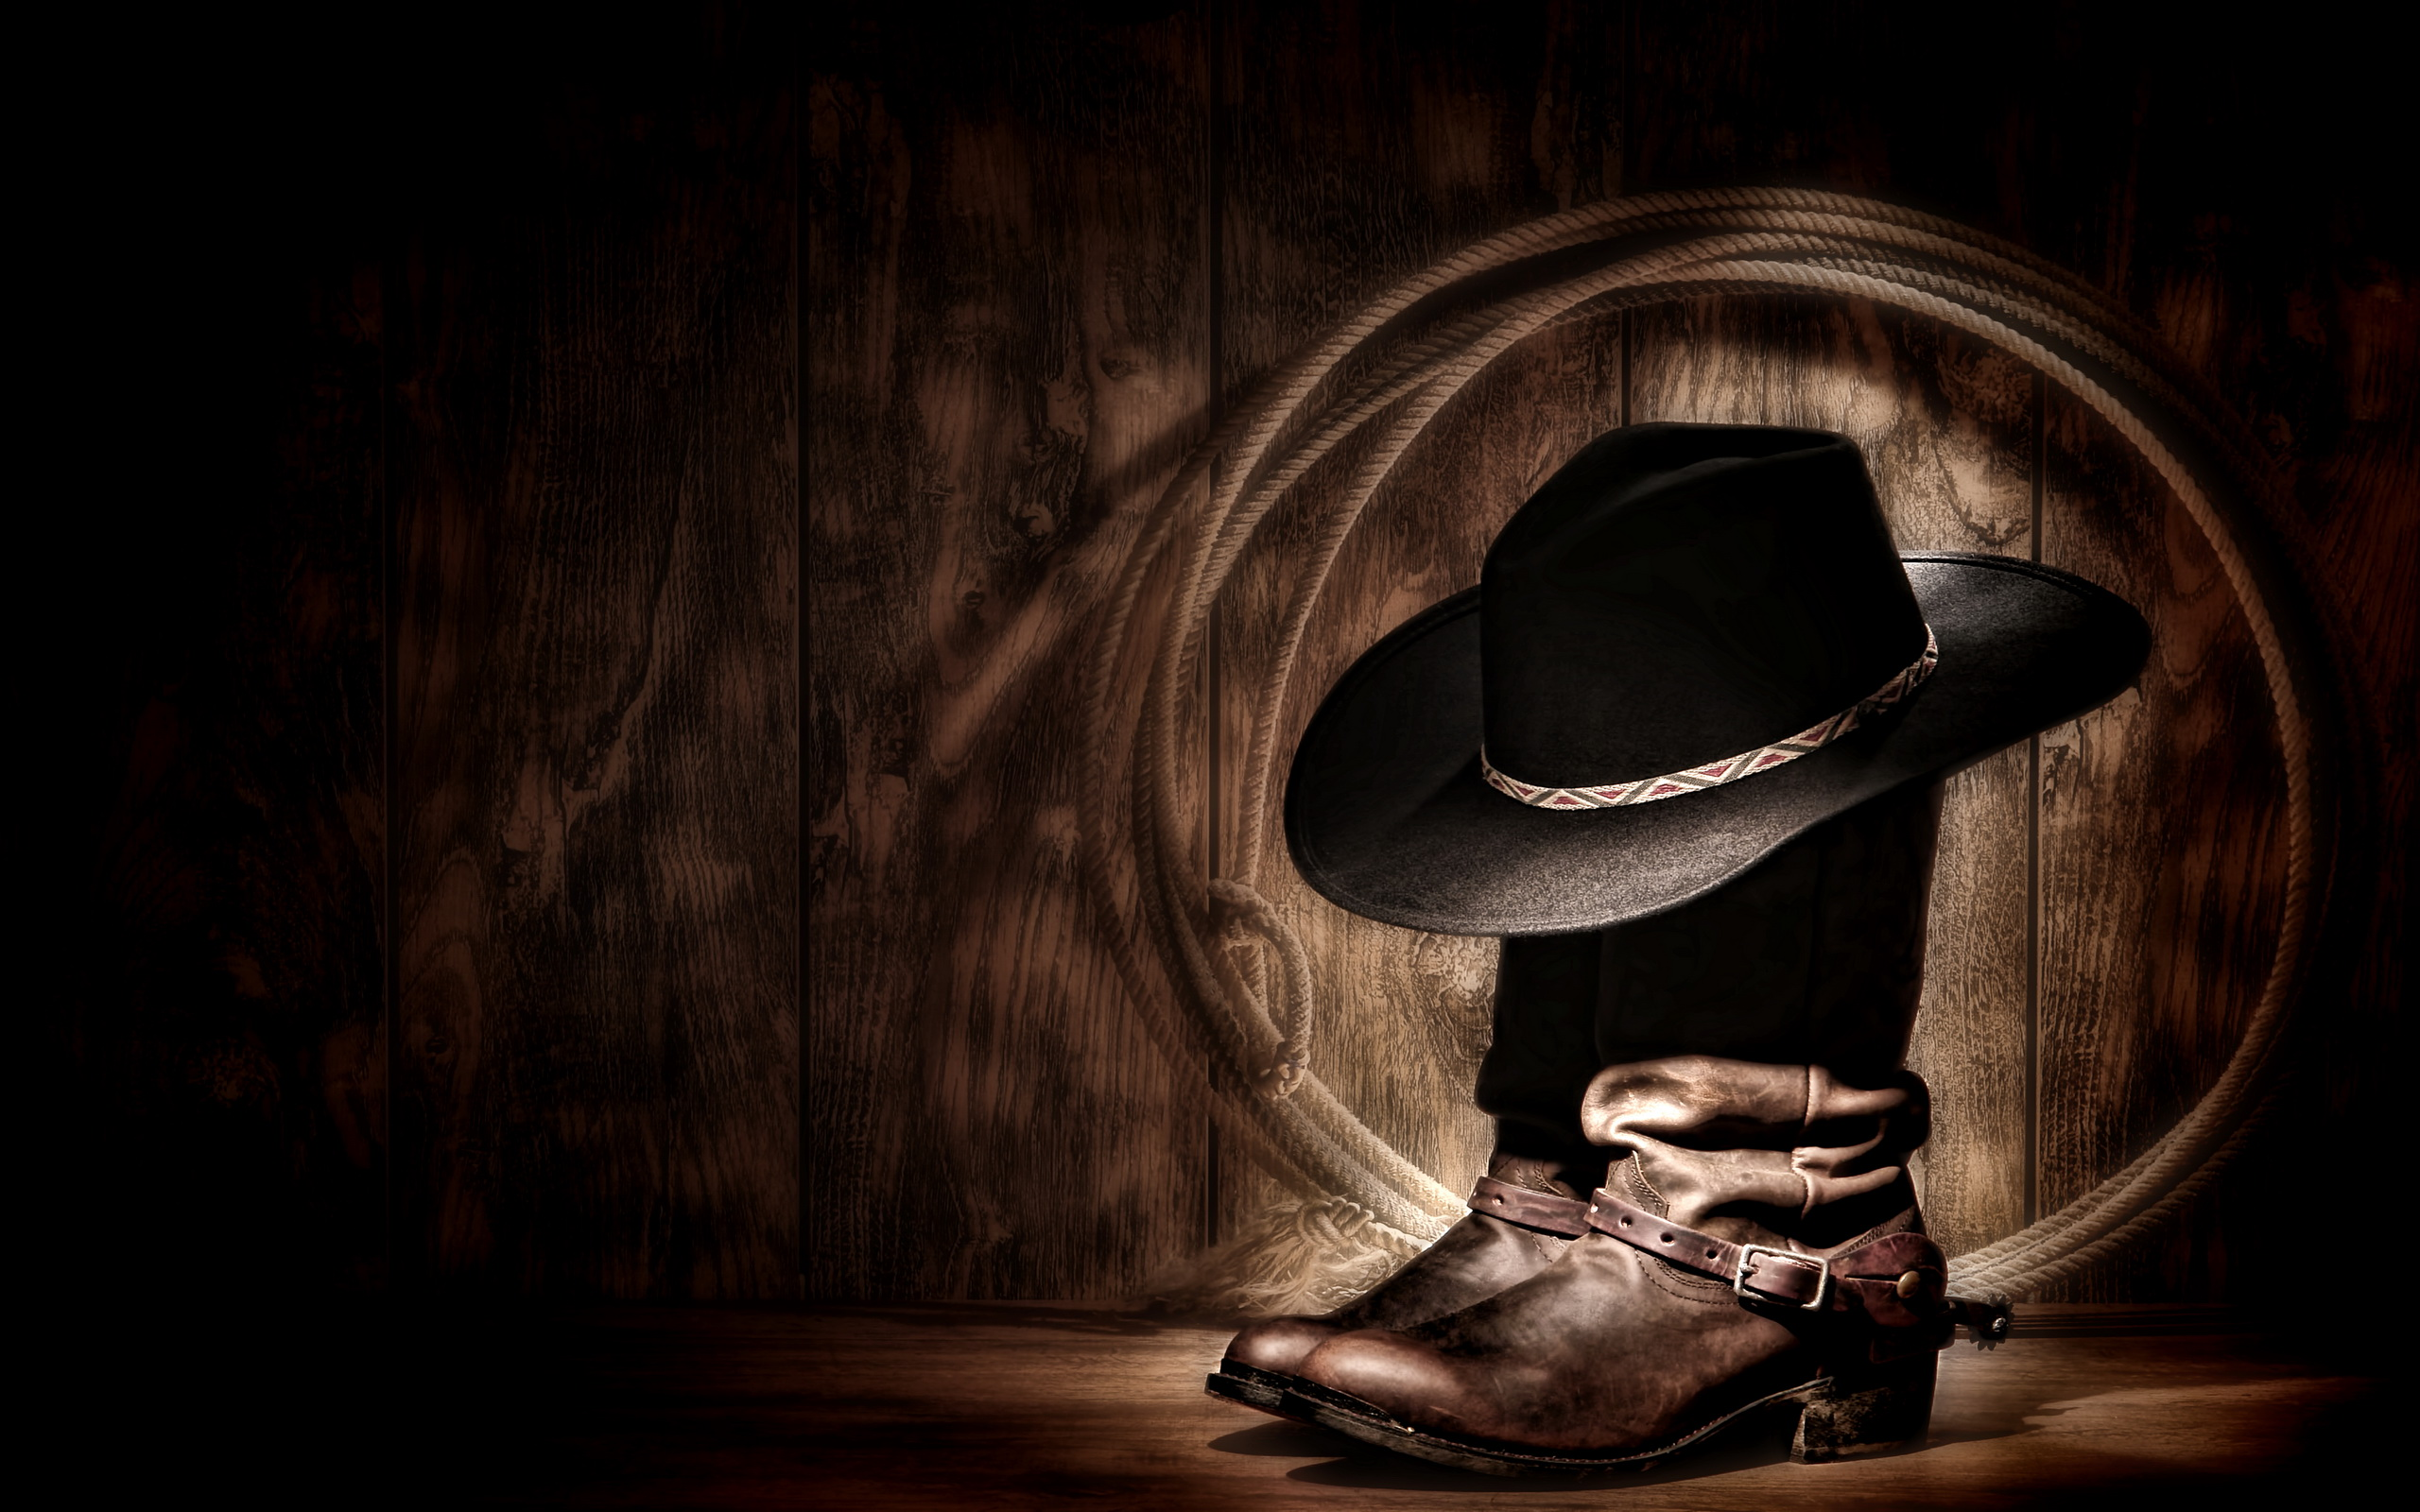 Cowboy Wallpapers High Quality 2560x1600